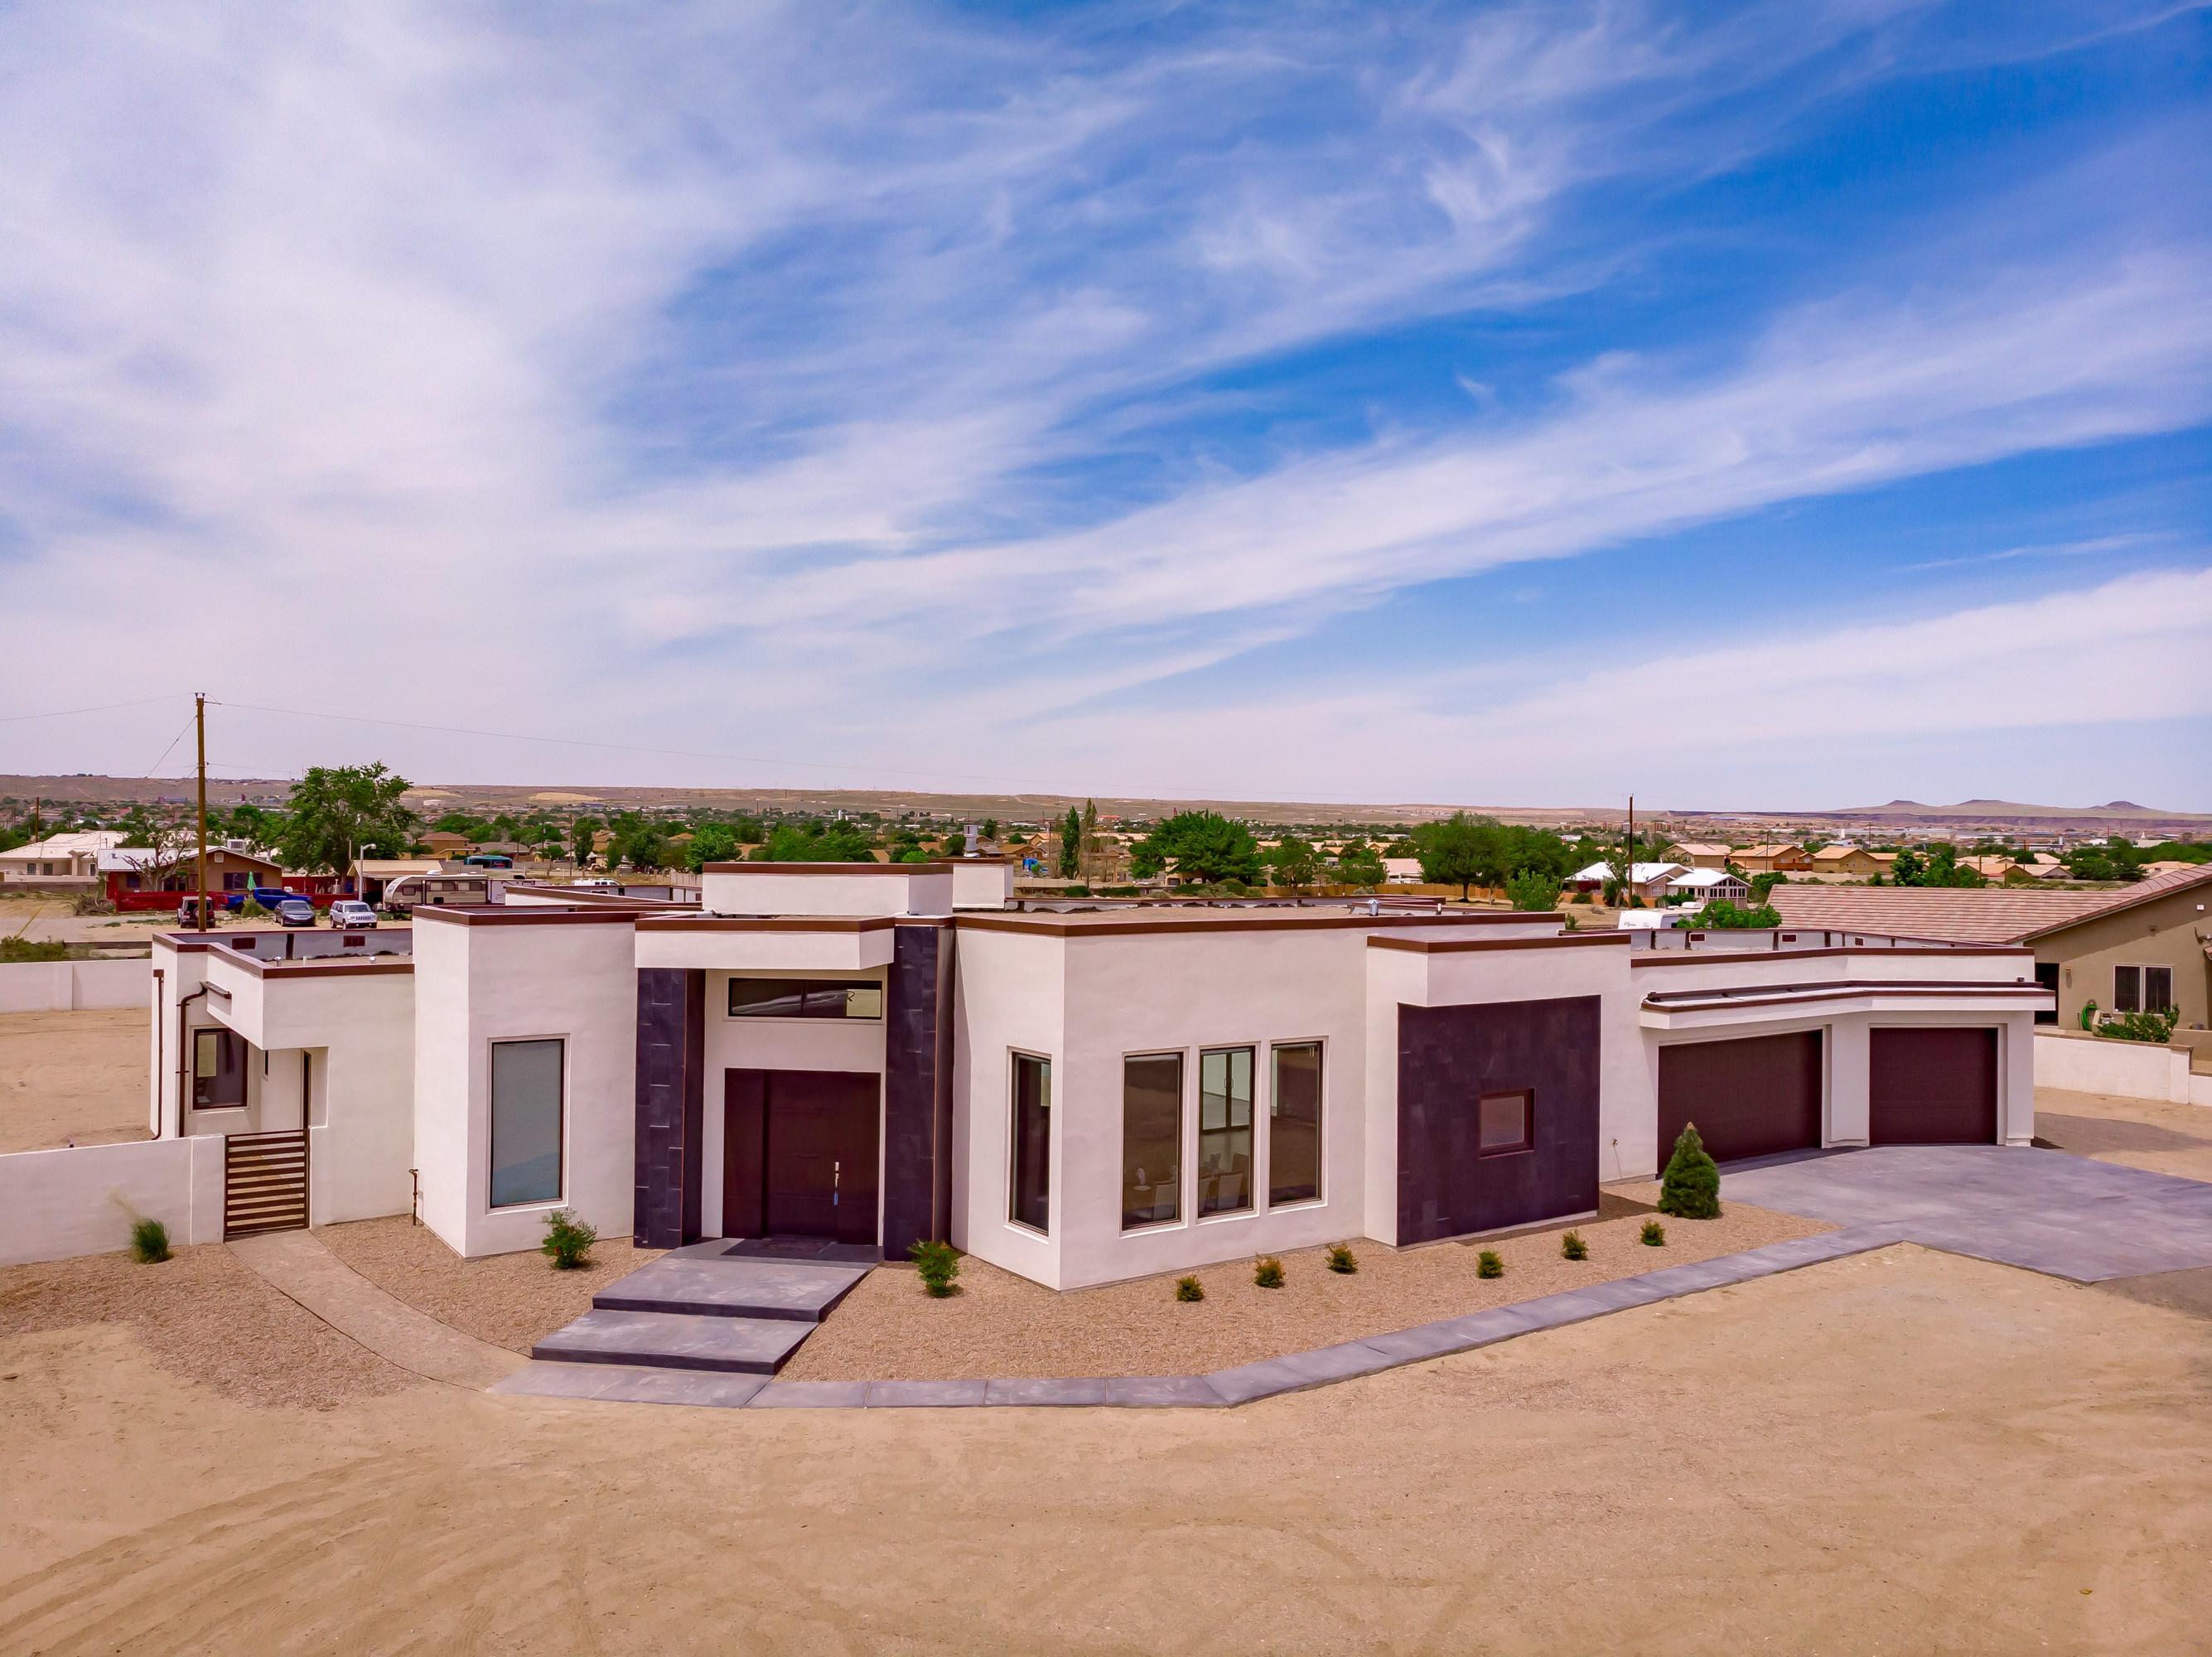 3635 Tower Rd SW, Albuquerque, NM 87121 - Albuquerque, NM real estate listing